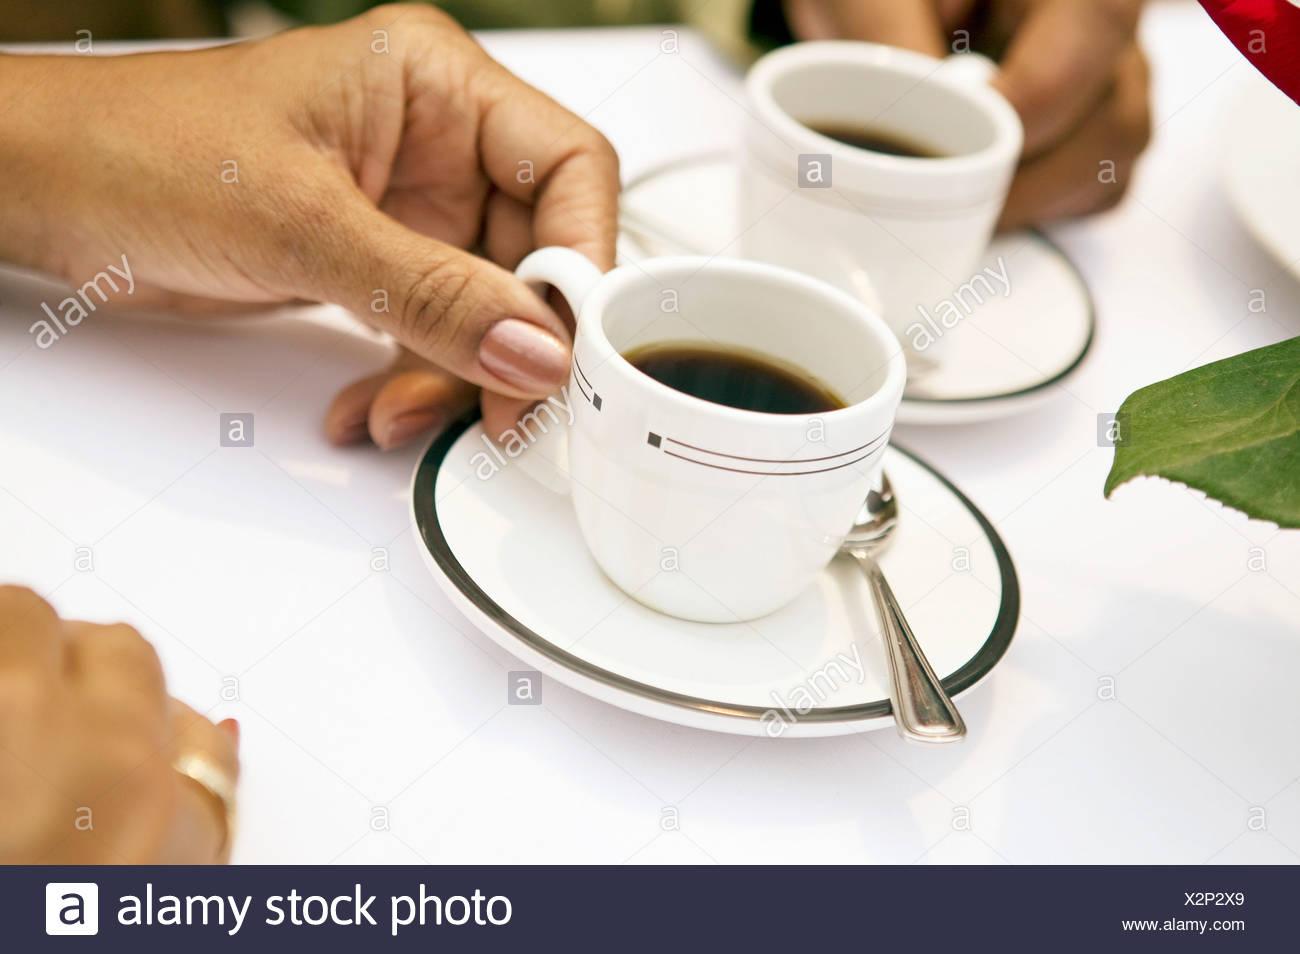 African woman holding espresso mug - Stock Image